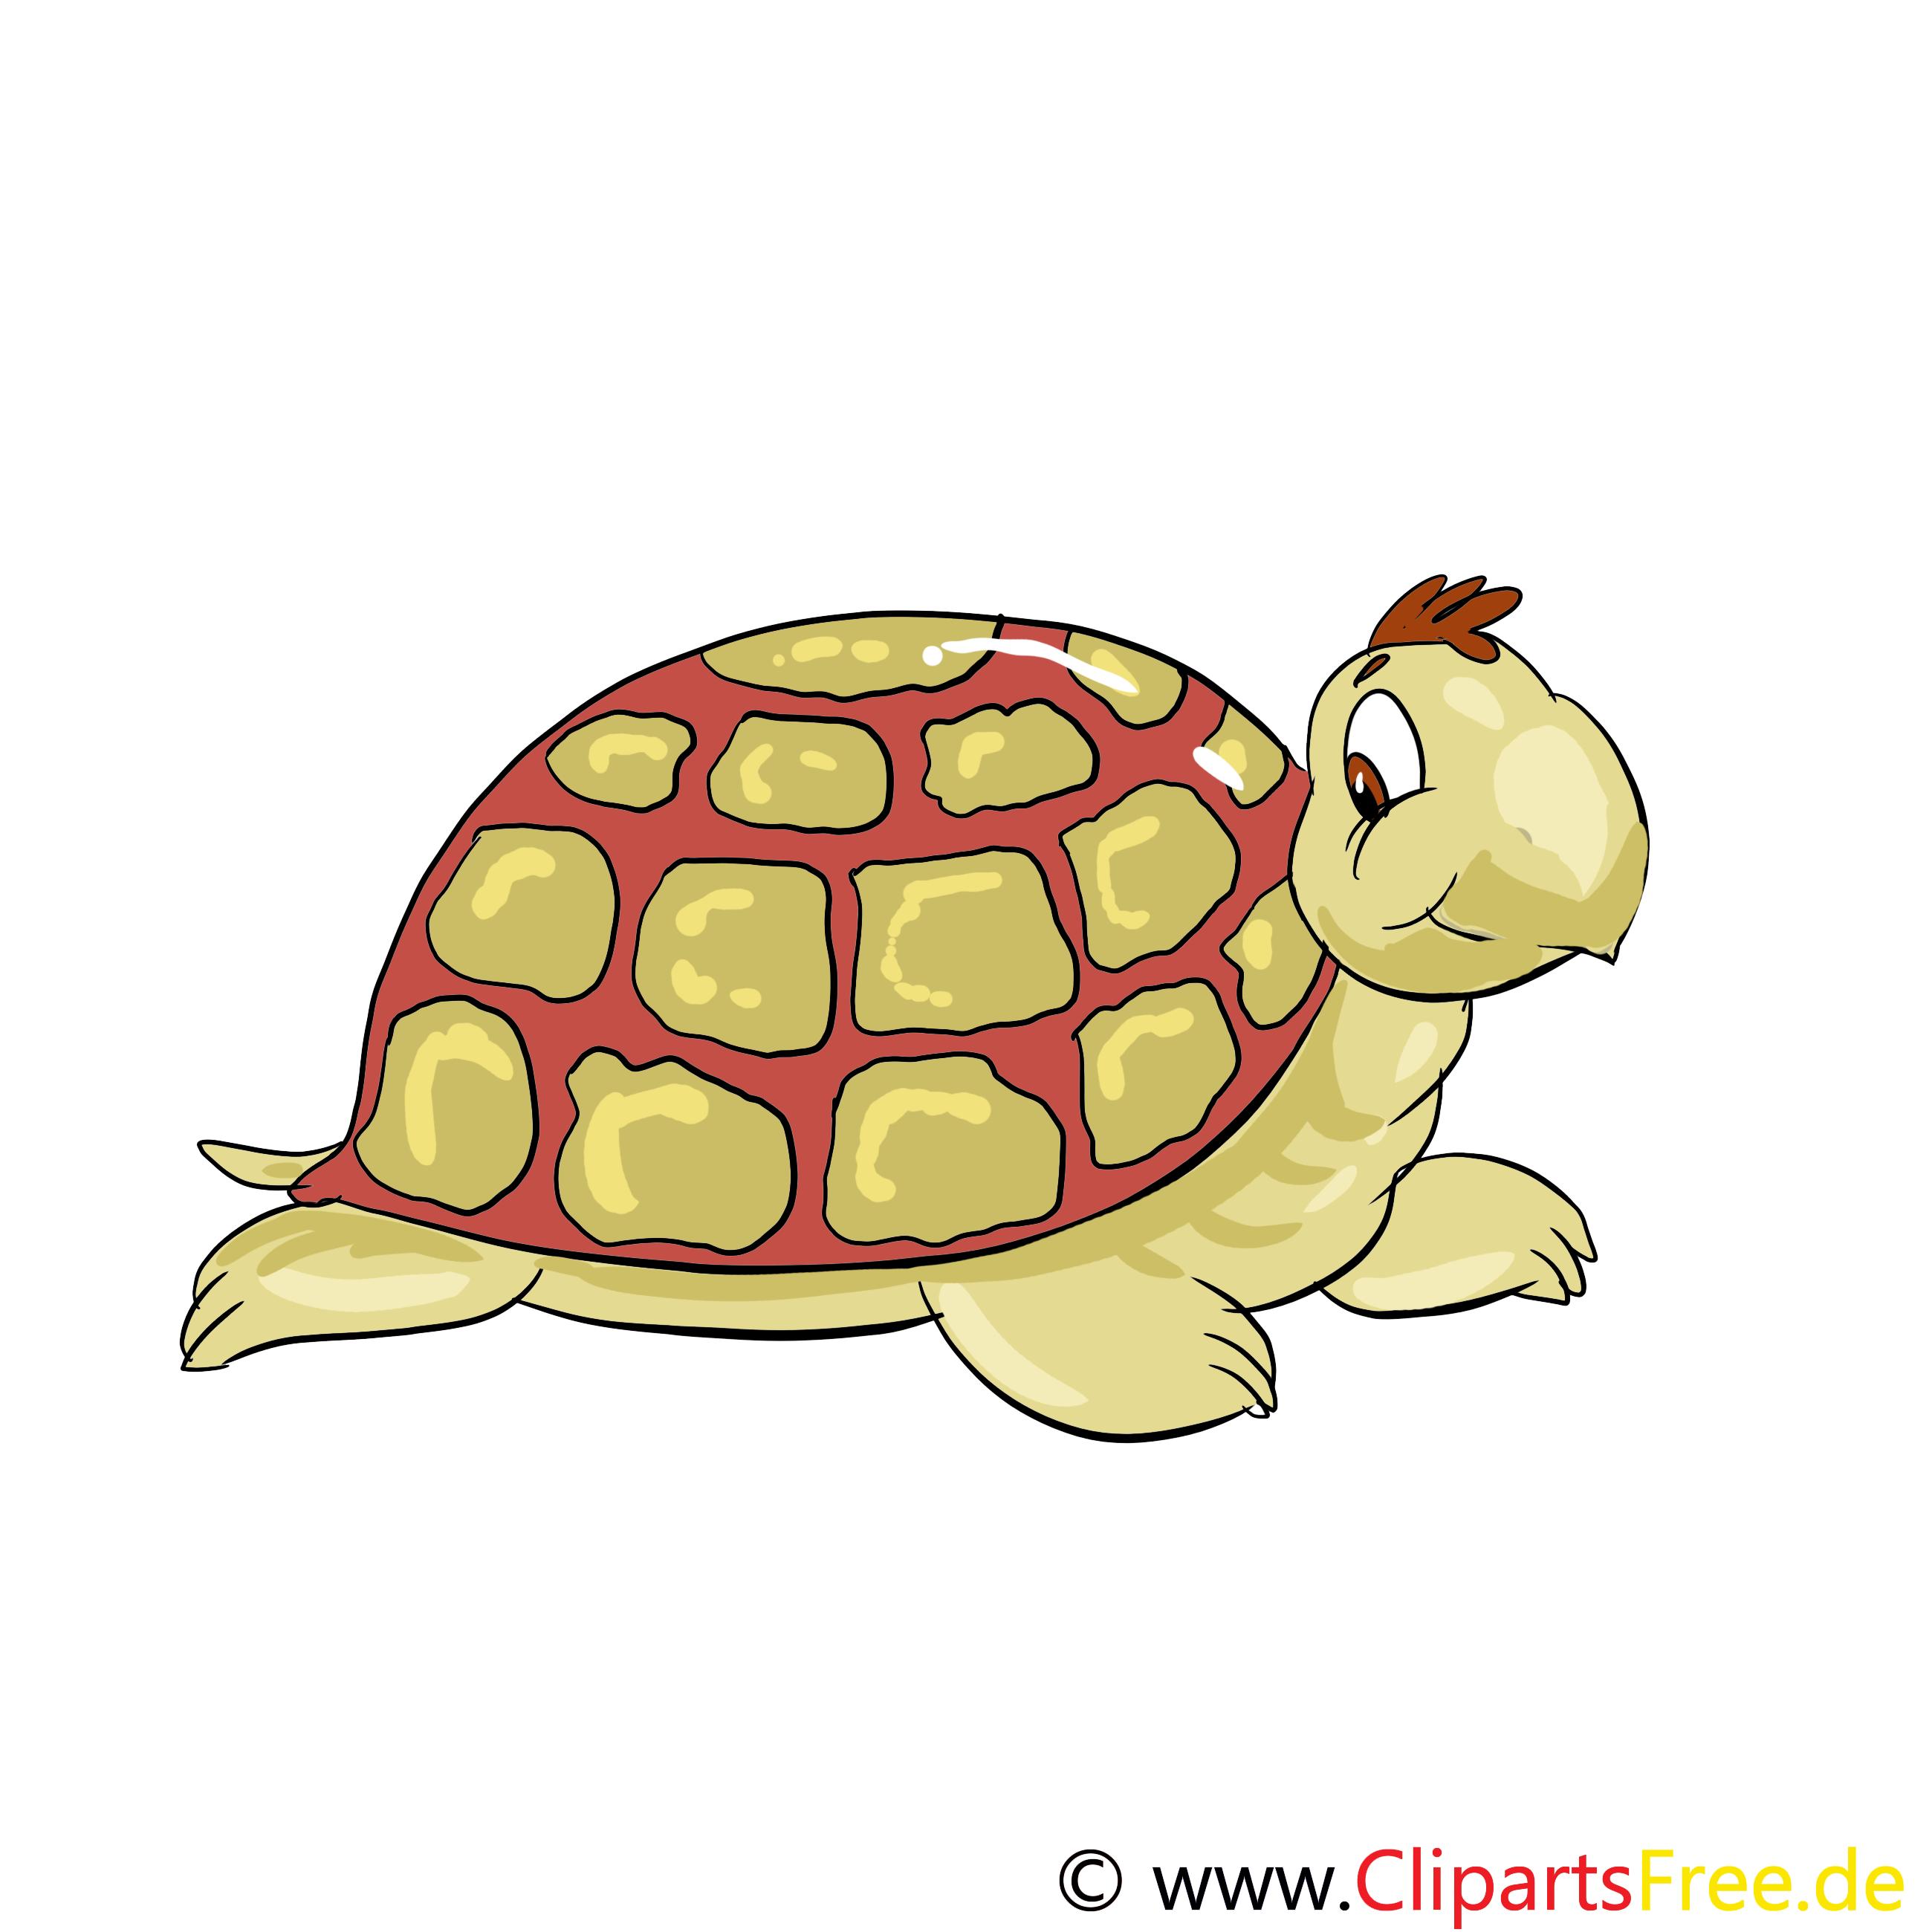 Clipart Bibliothek Tiere im Zoo - Schildkröte